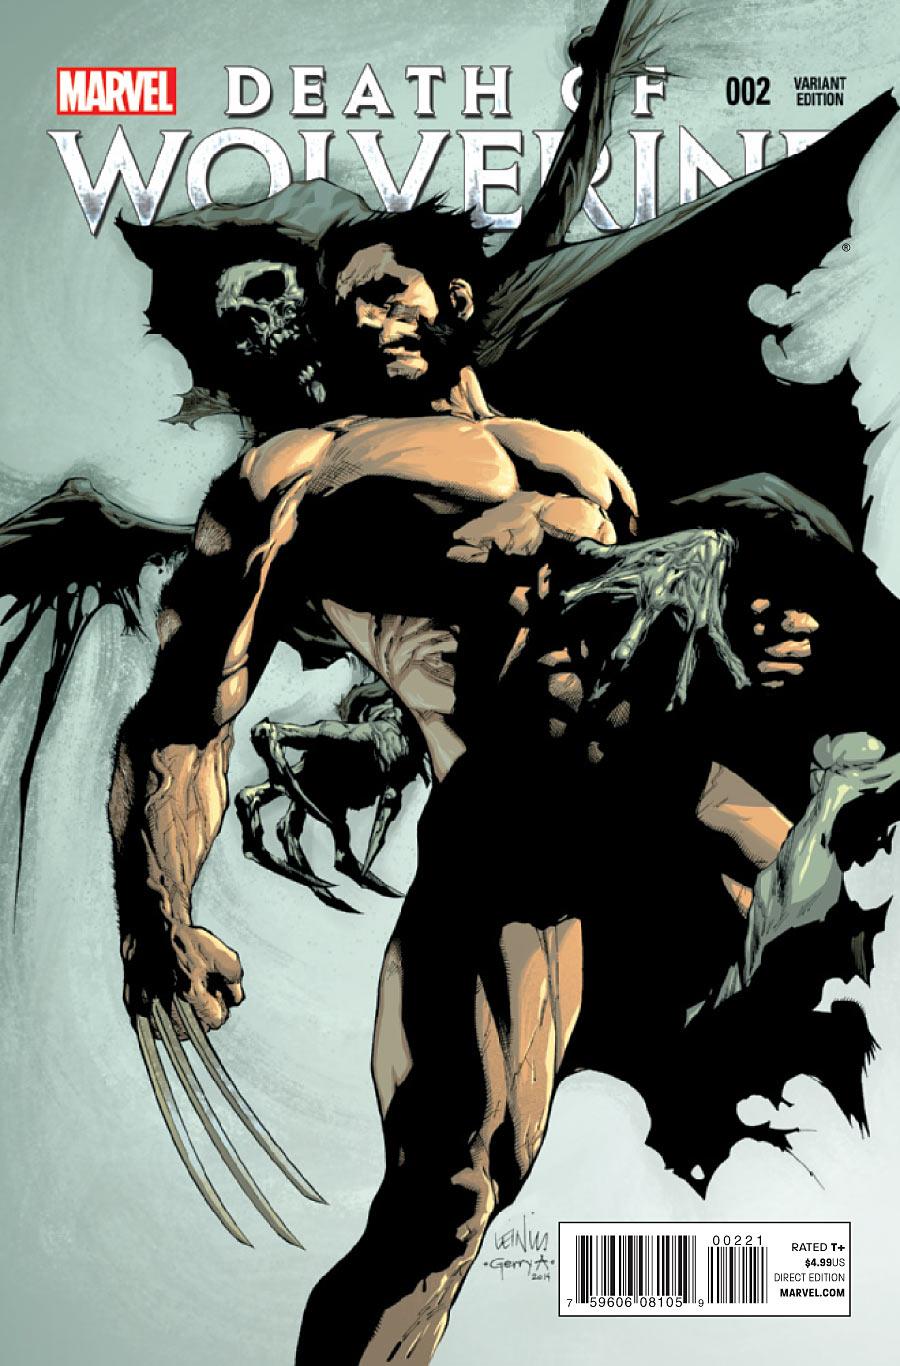 La Mort de Wolverine 2 - Death of Wolverine Part Two (Leinel Francis yu Variant Cover)